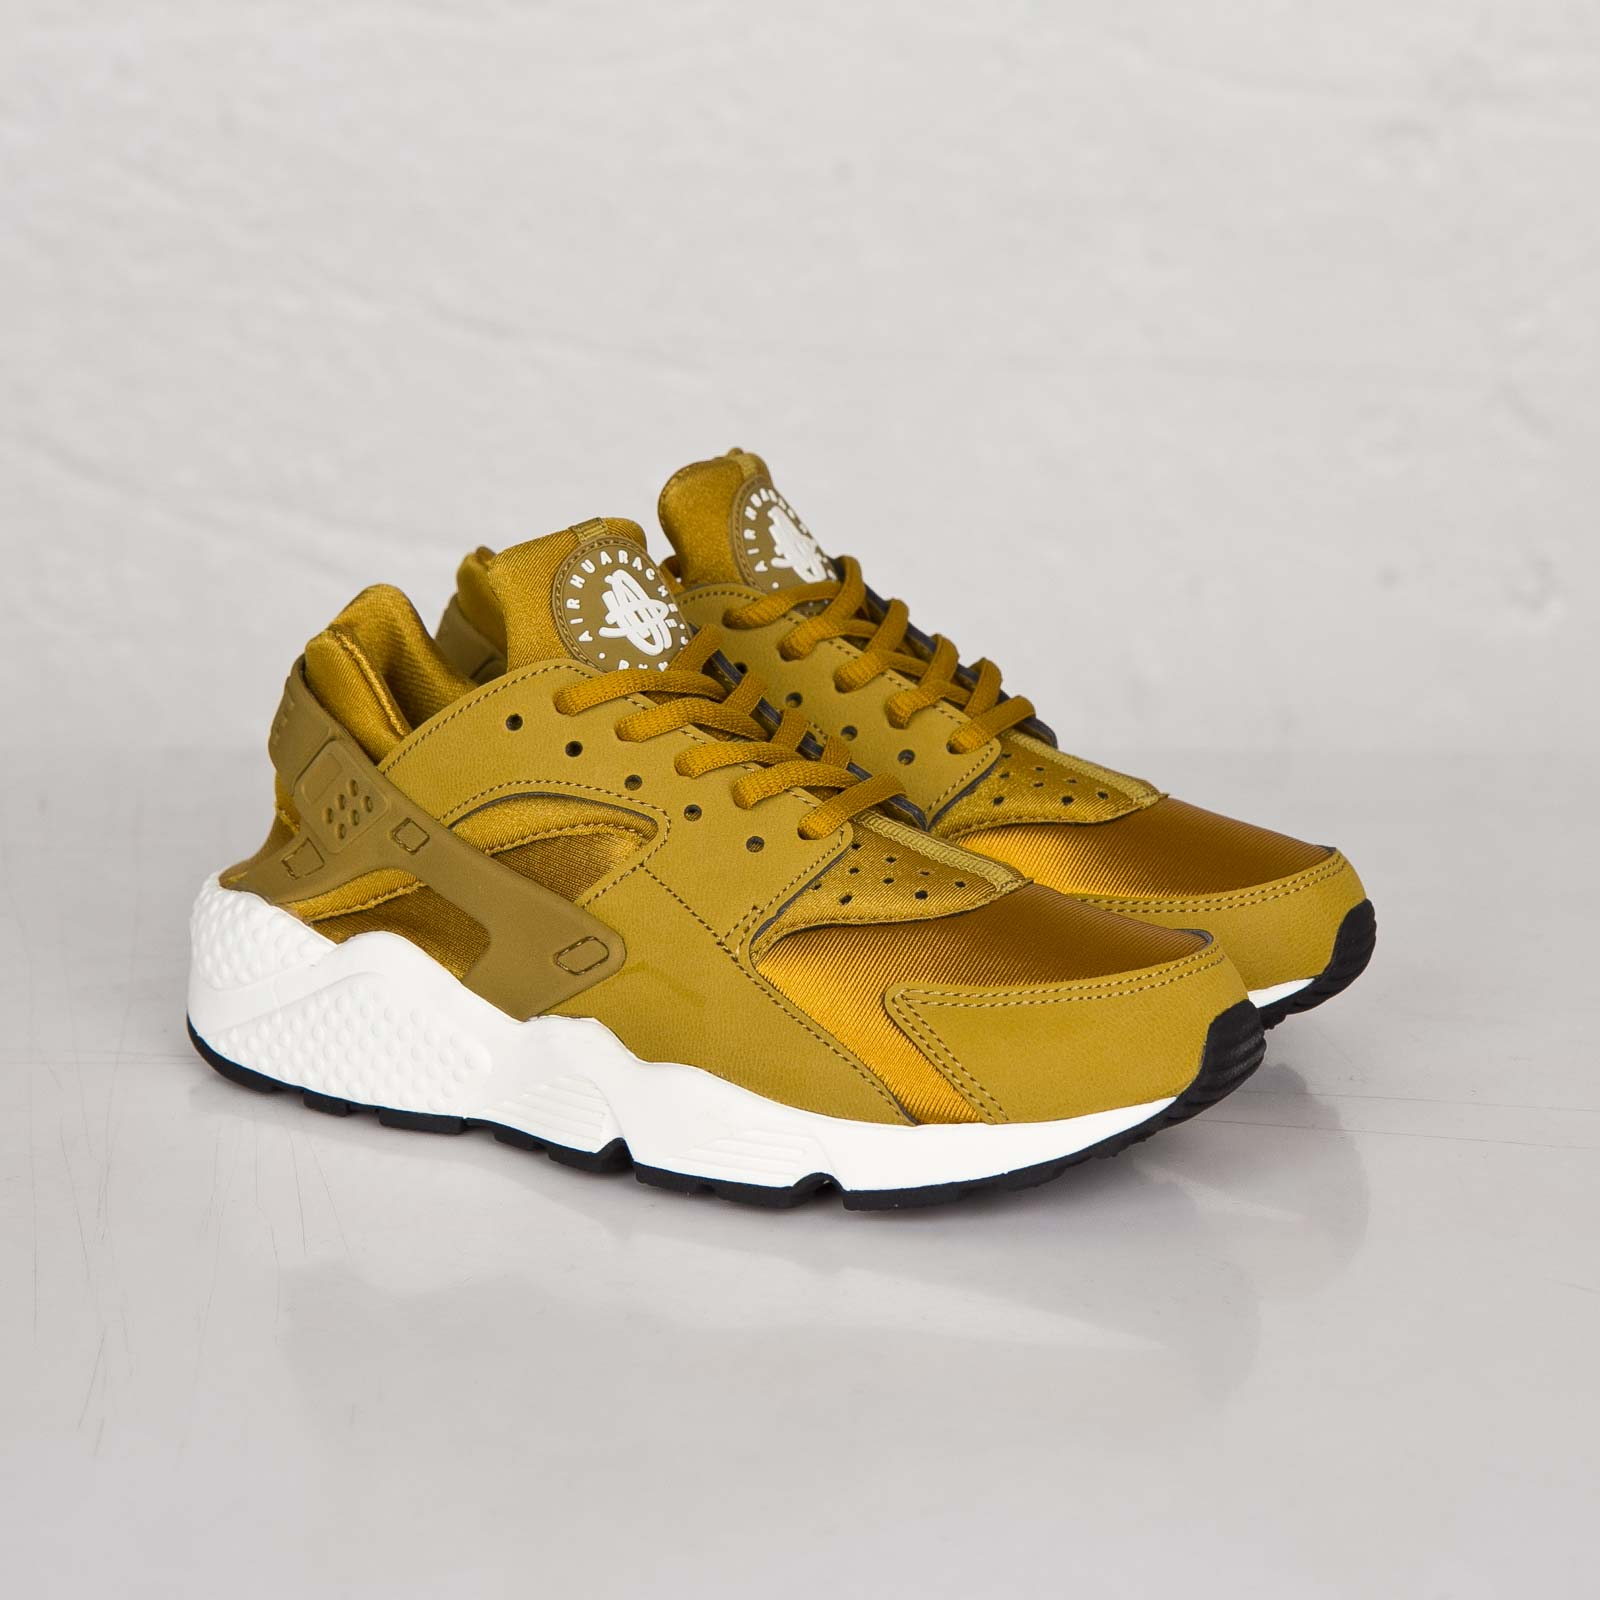 finest selection 70528 4a8fd Nike Wmns Air Huarache Run